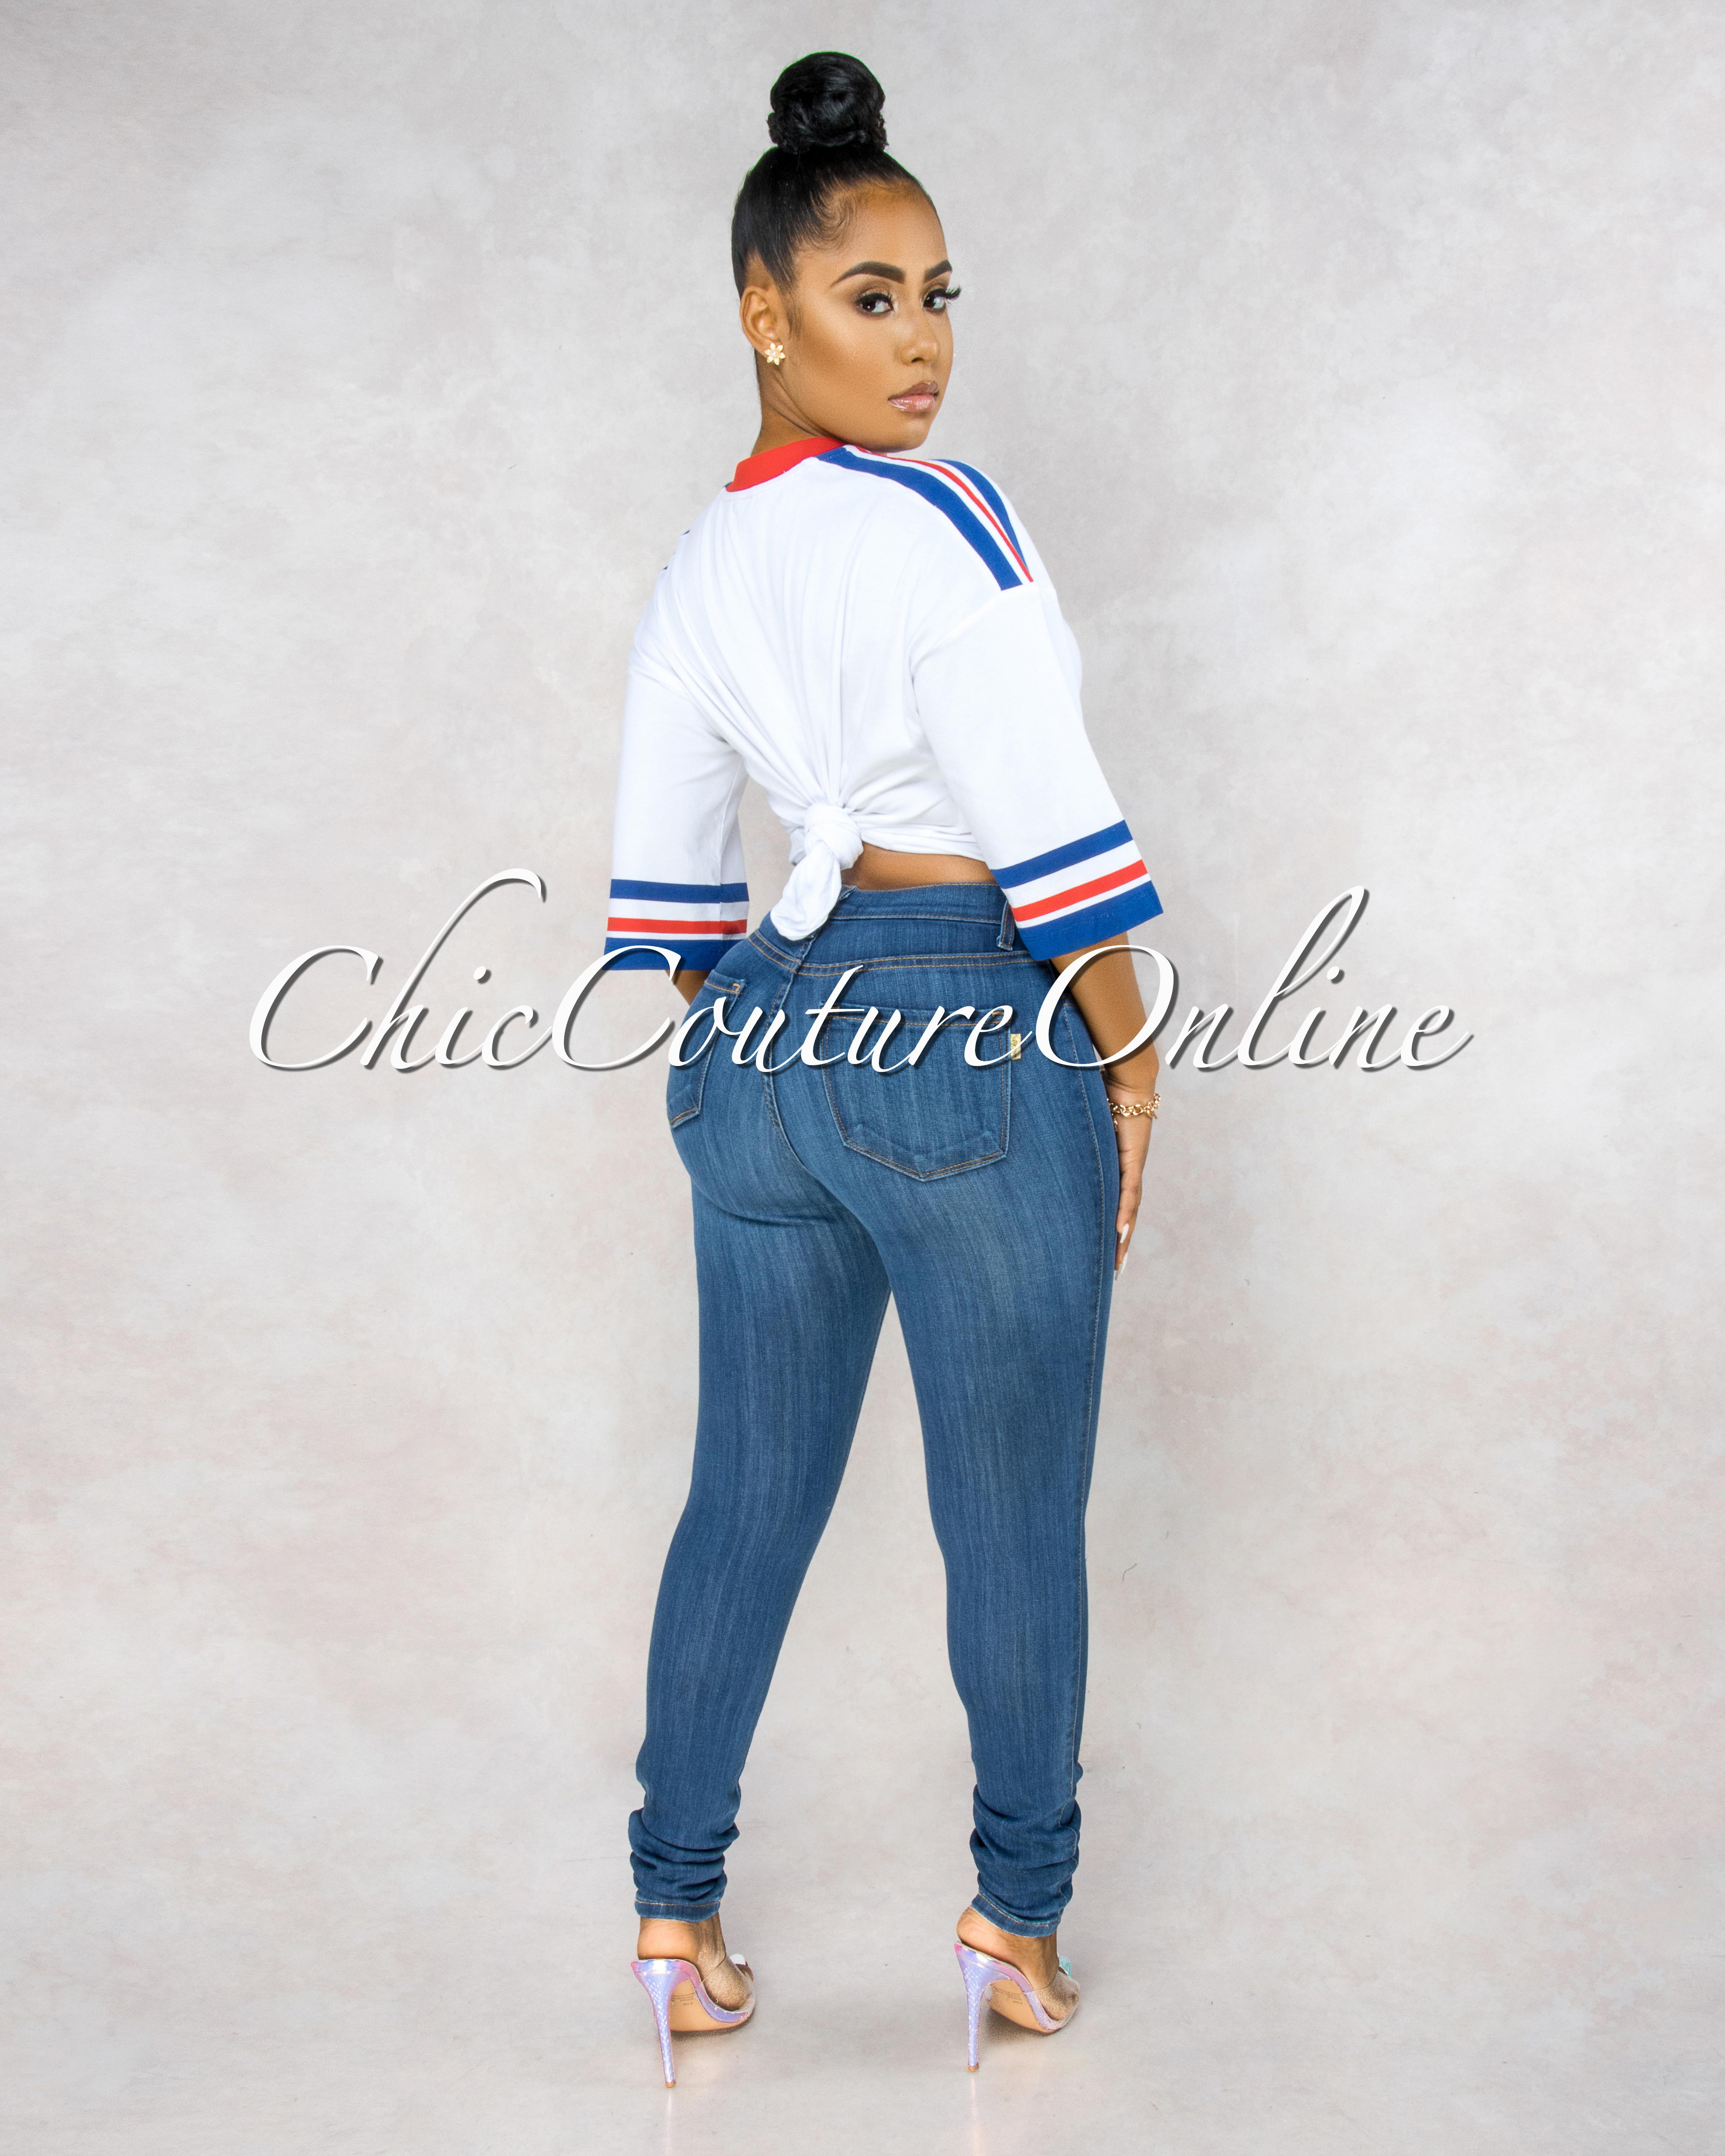 Kenya Medium Denim Cut-Out Knees Skinny Jeans